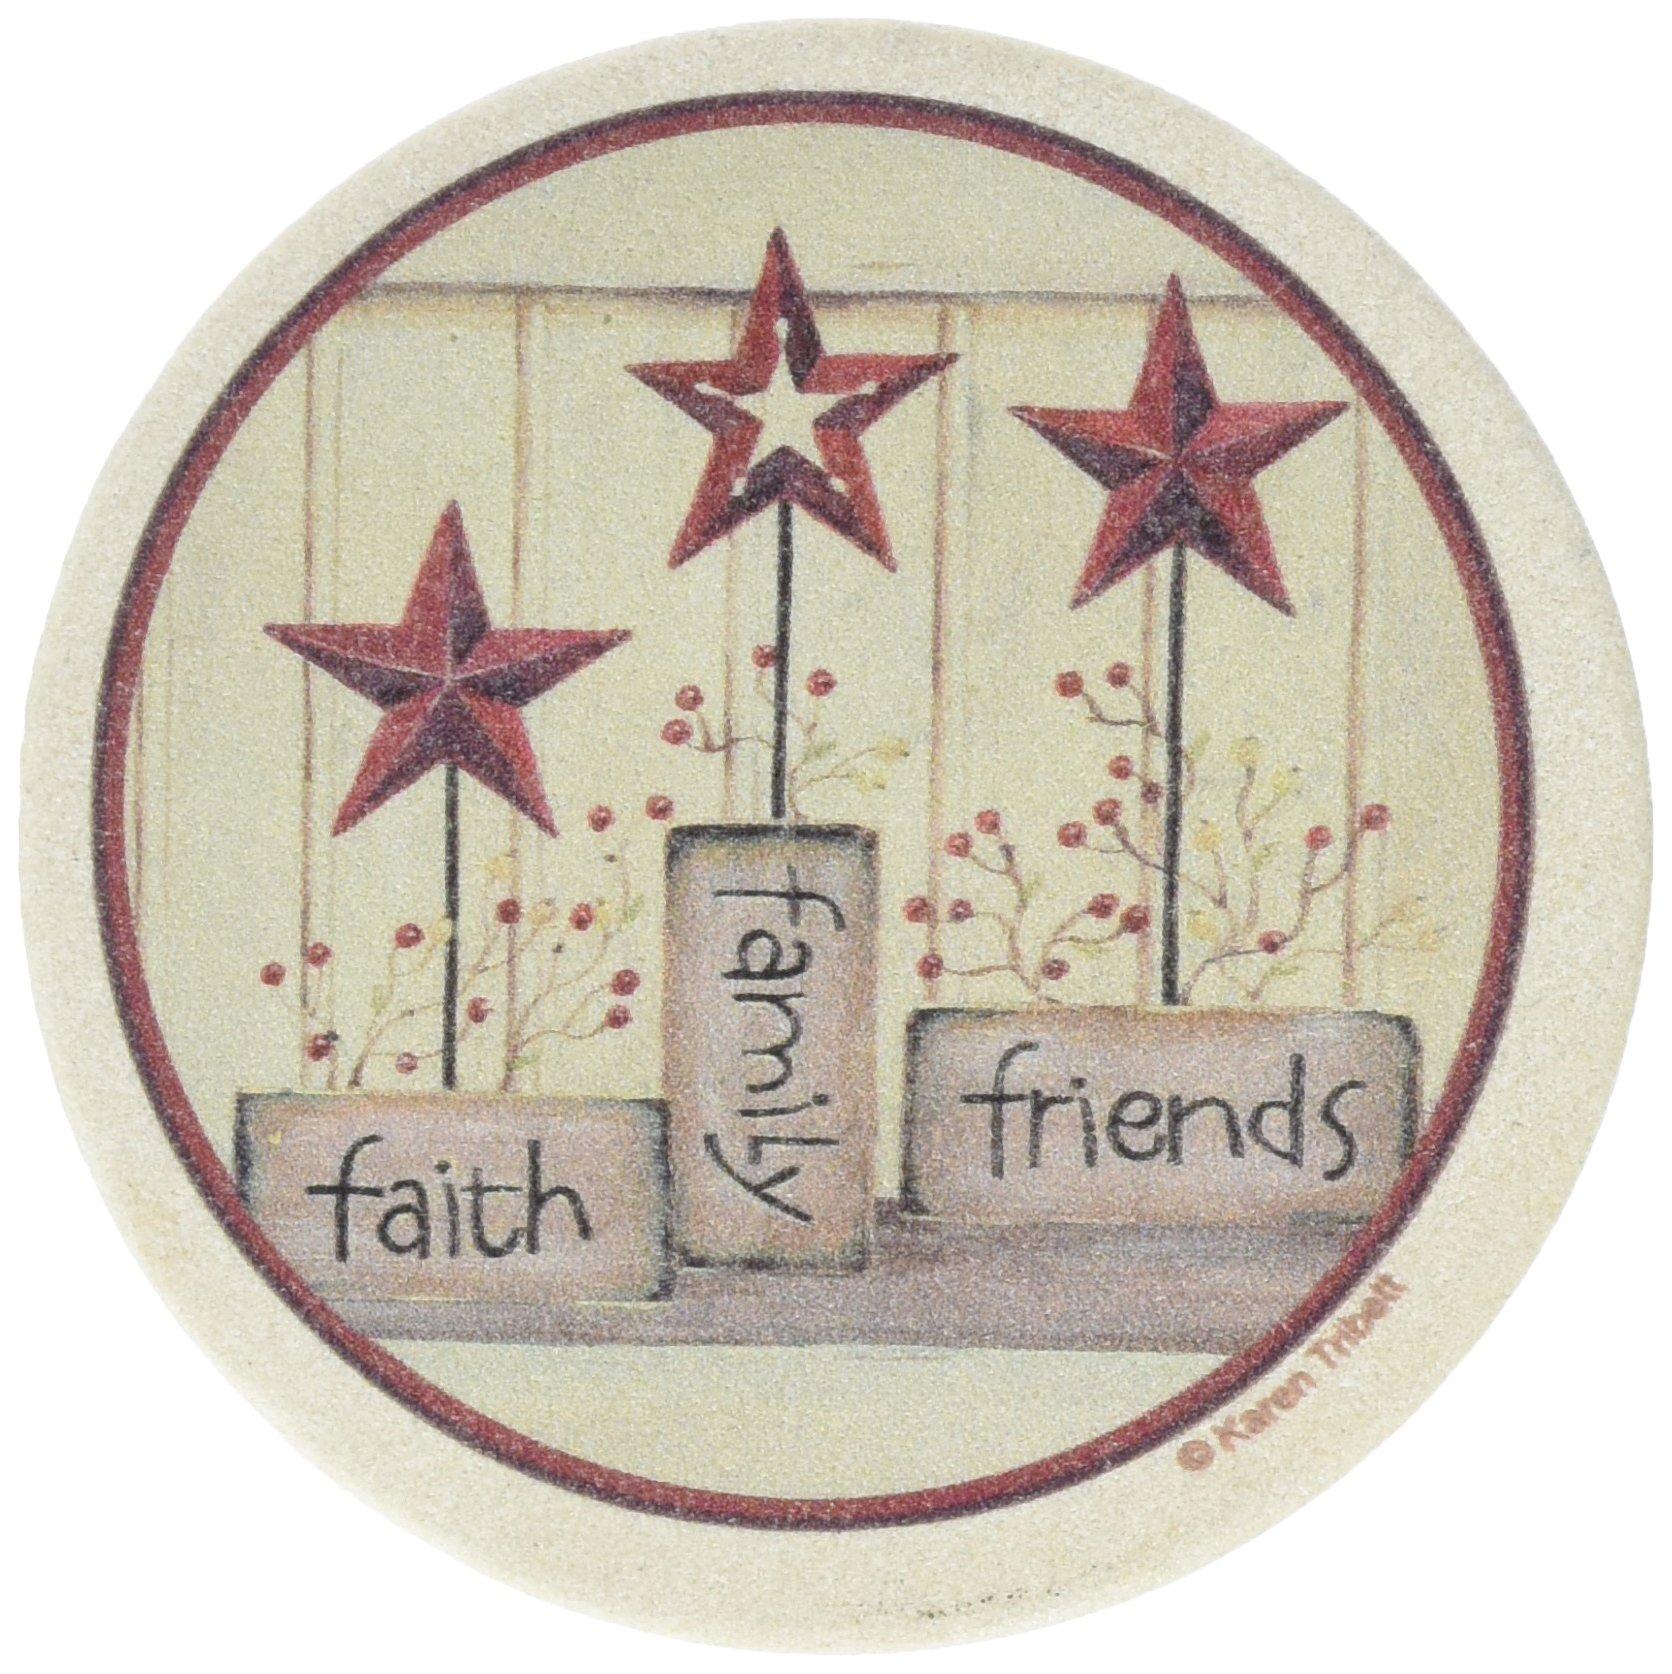 Thirstystone TSKB2�Natural Sandstone Coaster set Faith Family Friends